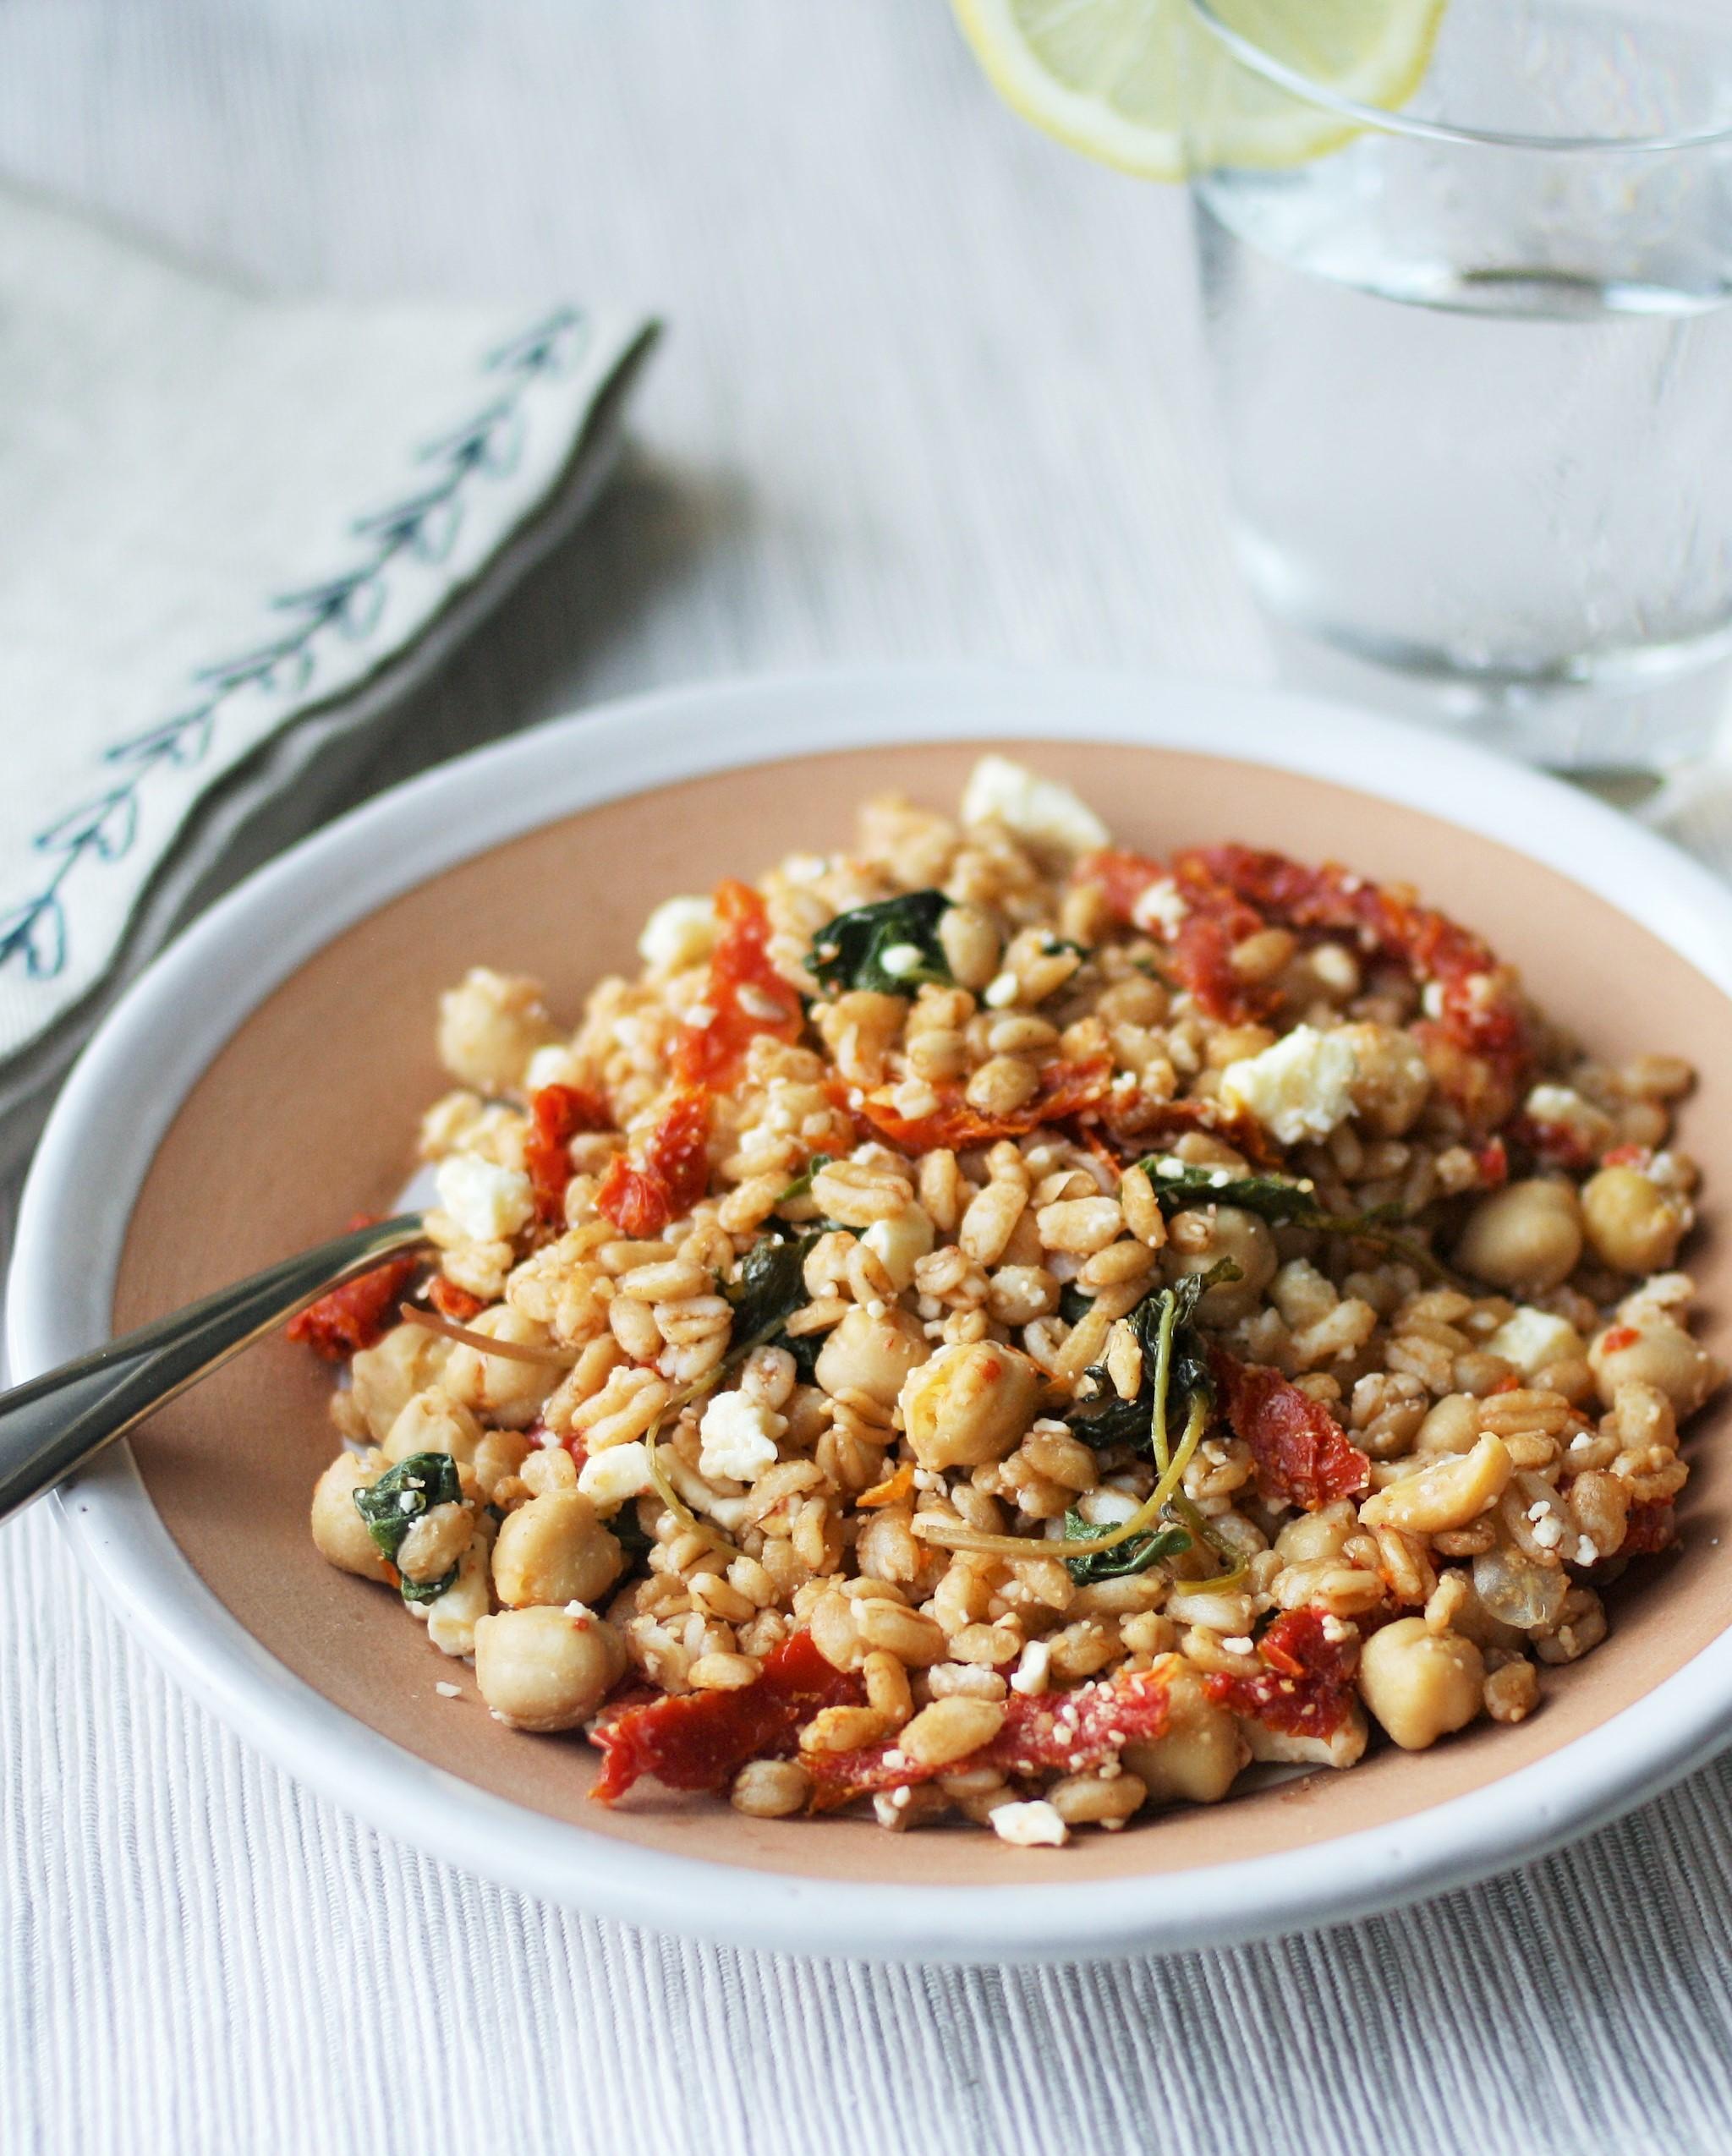 Mediterranean Farro Salad - Orchard Street Kitchen